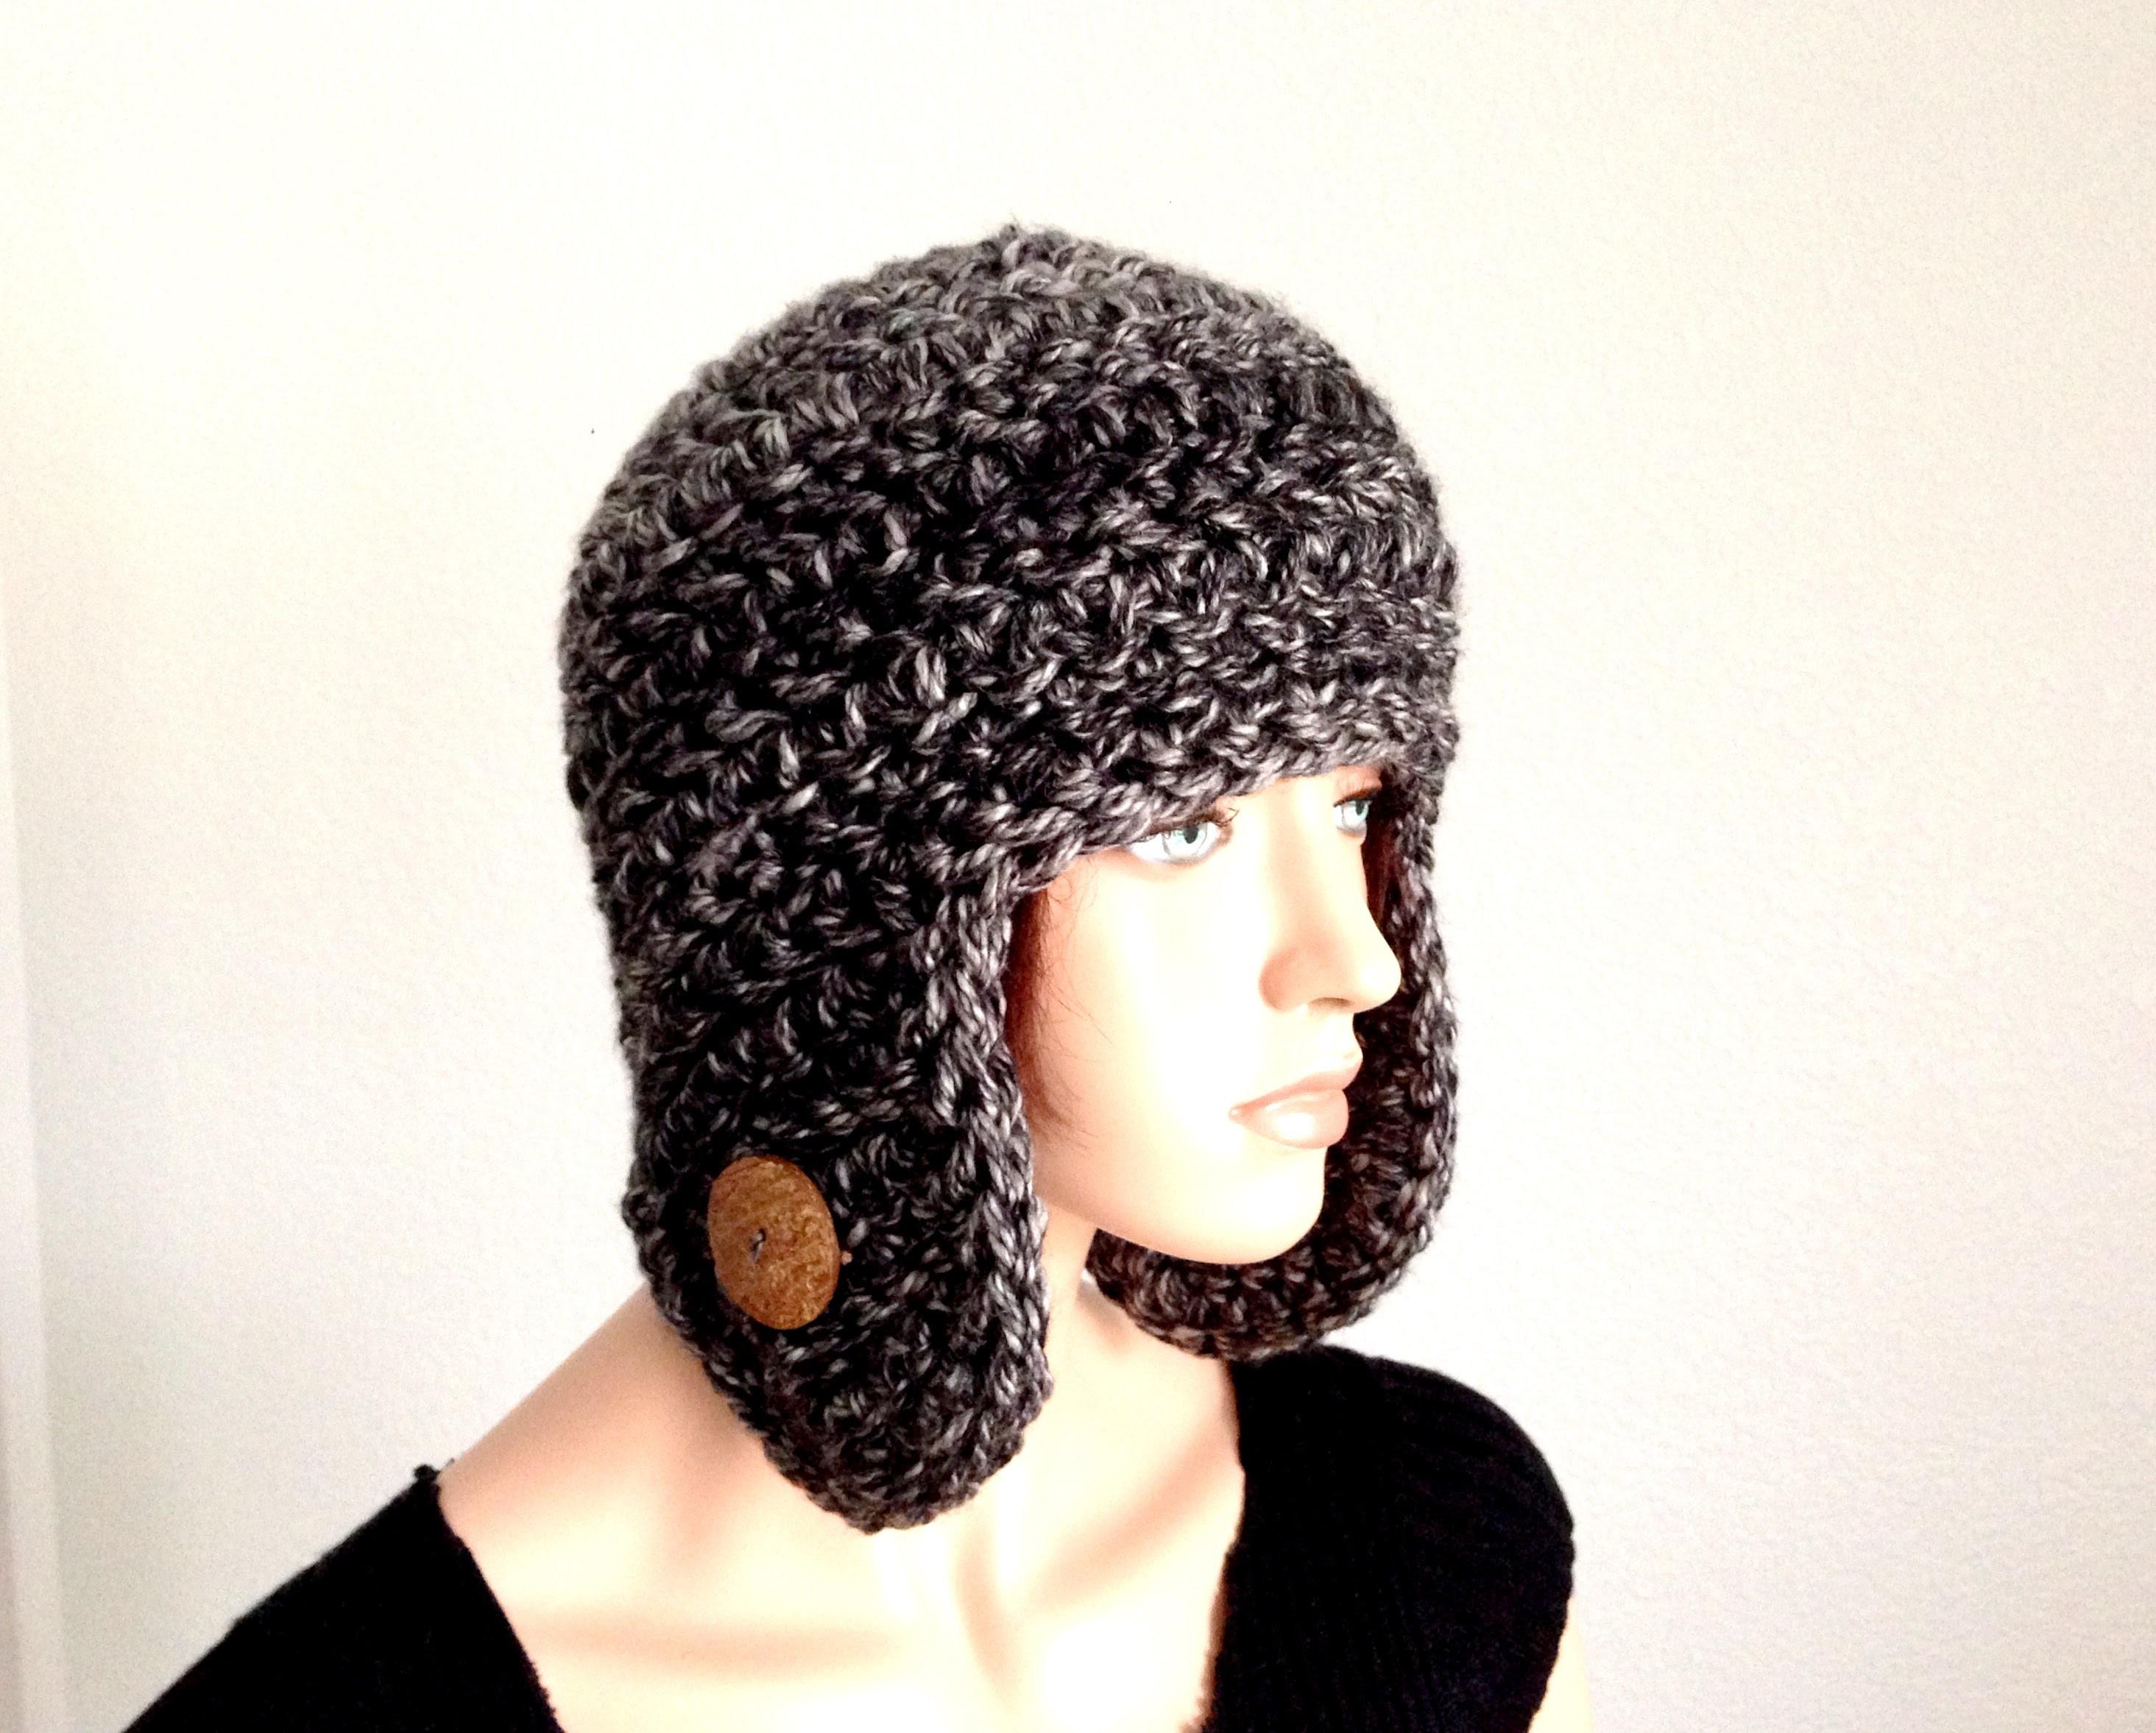 Tutorial: How to Crochet an Earflap Winter Beanie